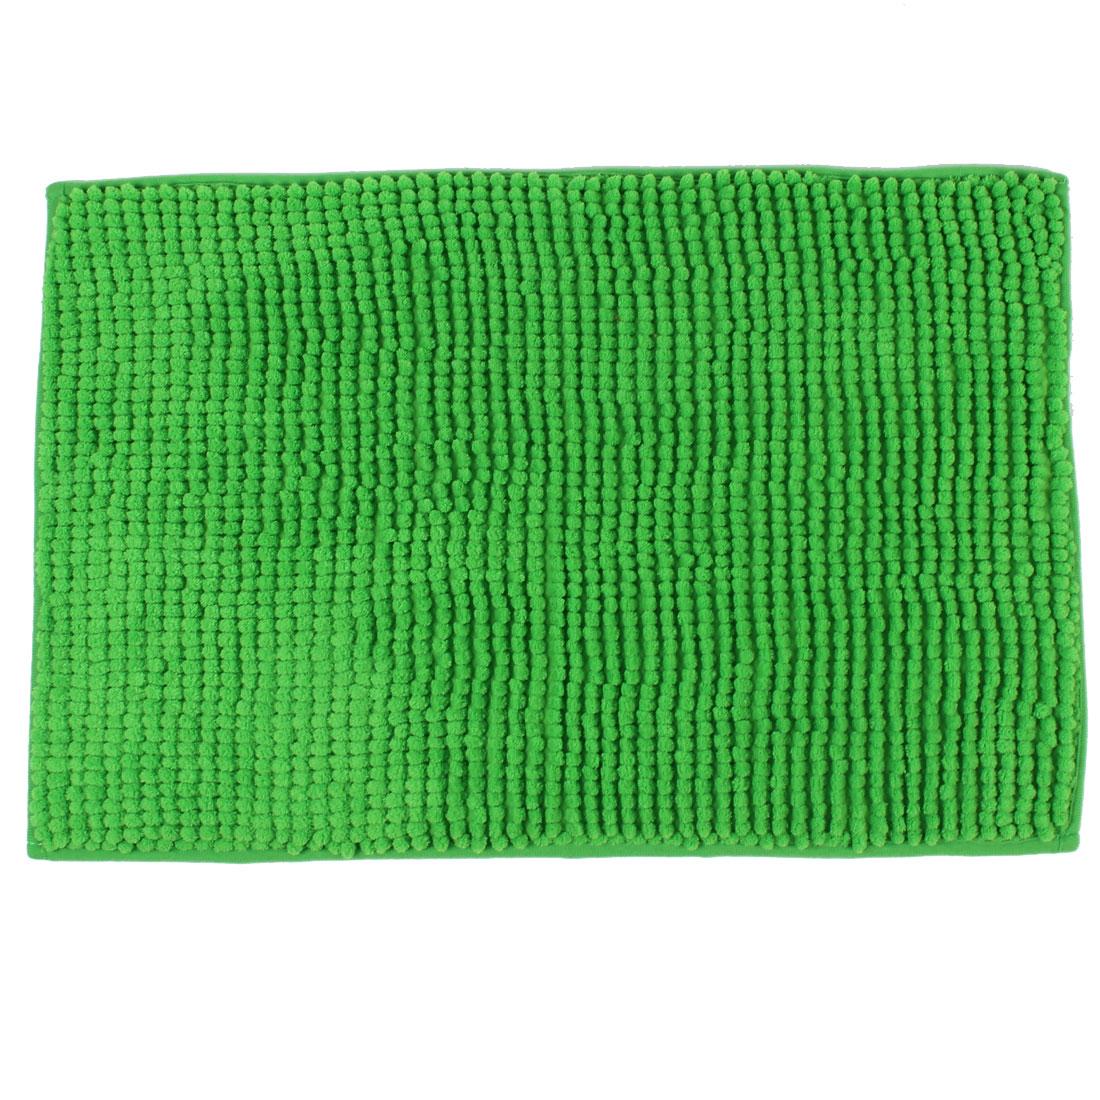 Hotel Bathroom Soft Hairy Non Slip Absorbent Bath Mat Carpet Green 24 x 16 Inch